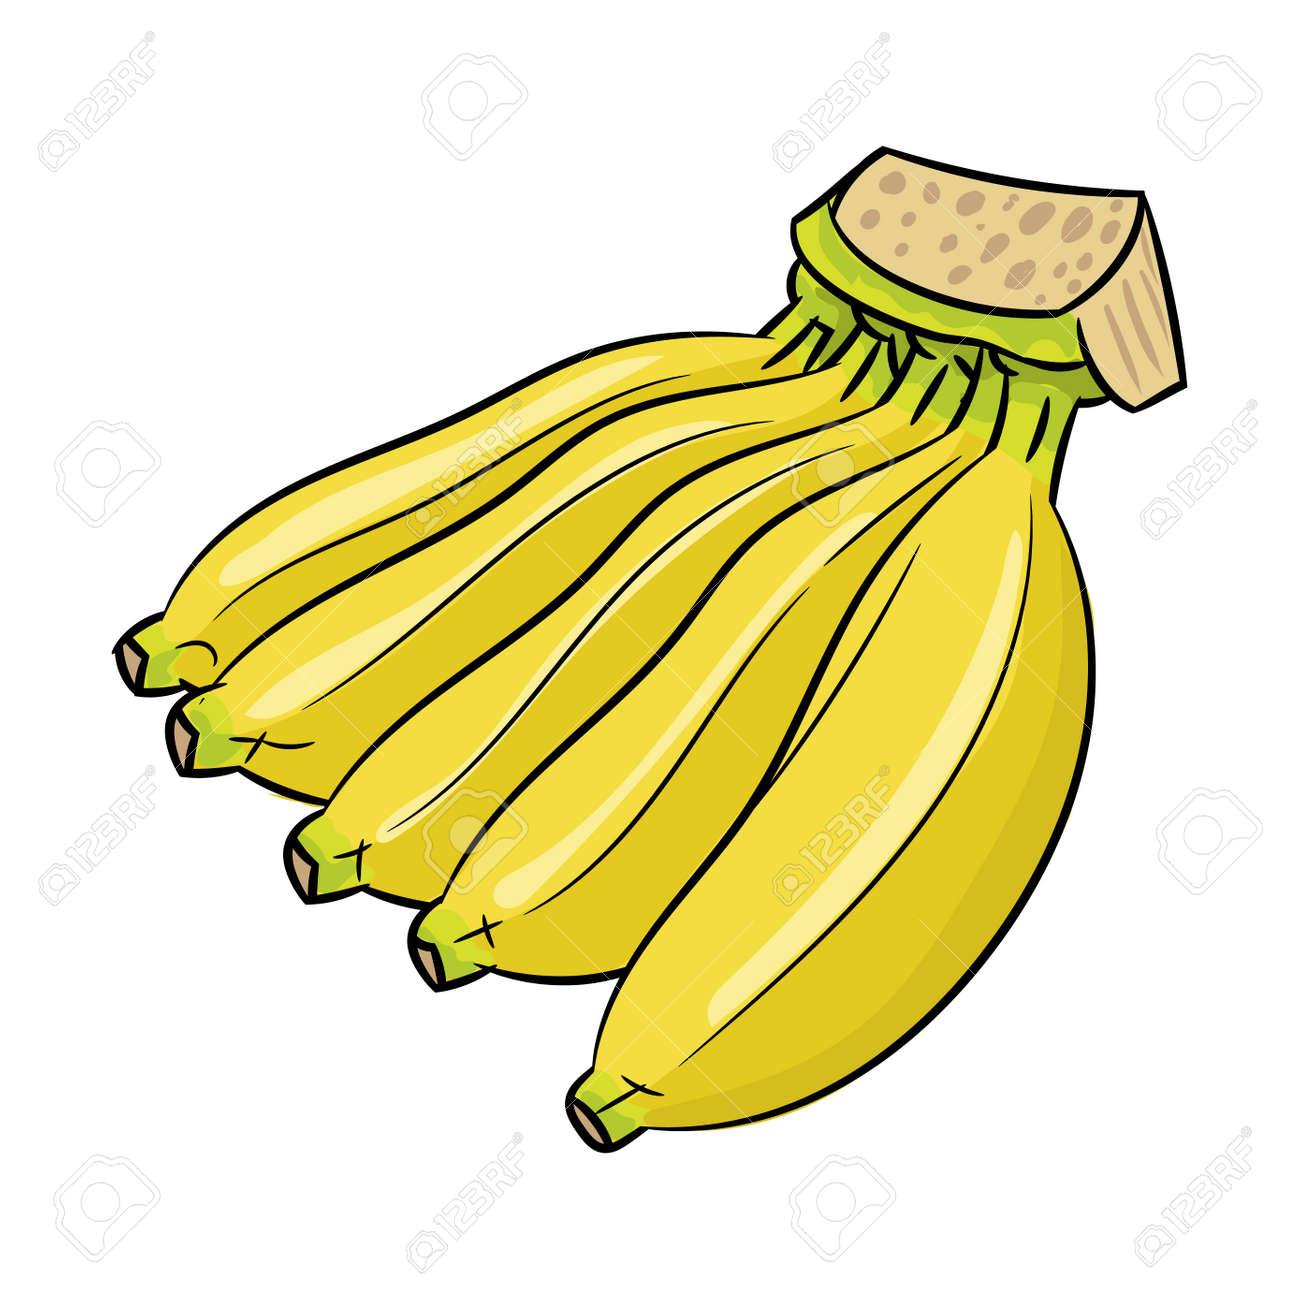 Banana Png Clipart - Cartoon Banana With Sunglasses Transparent Png  (#4903488) - PinClipart